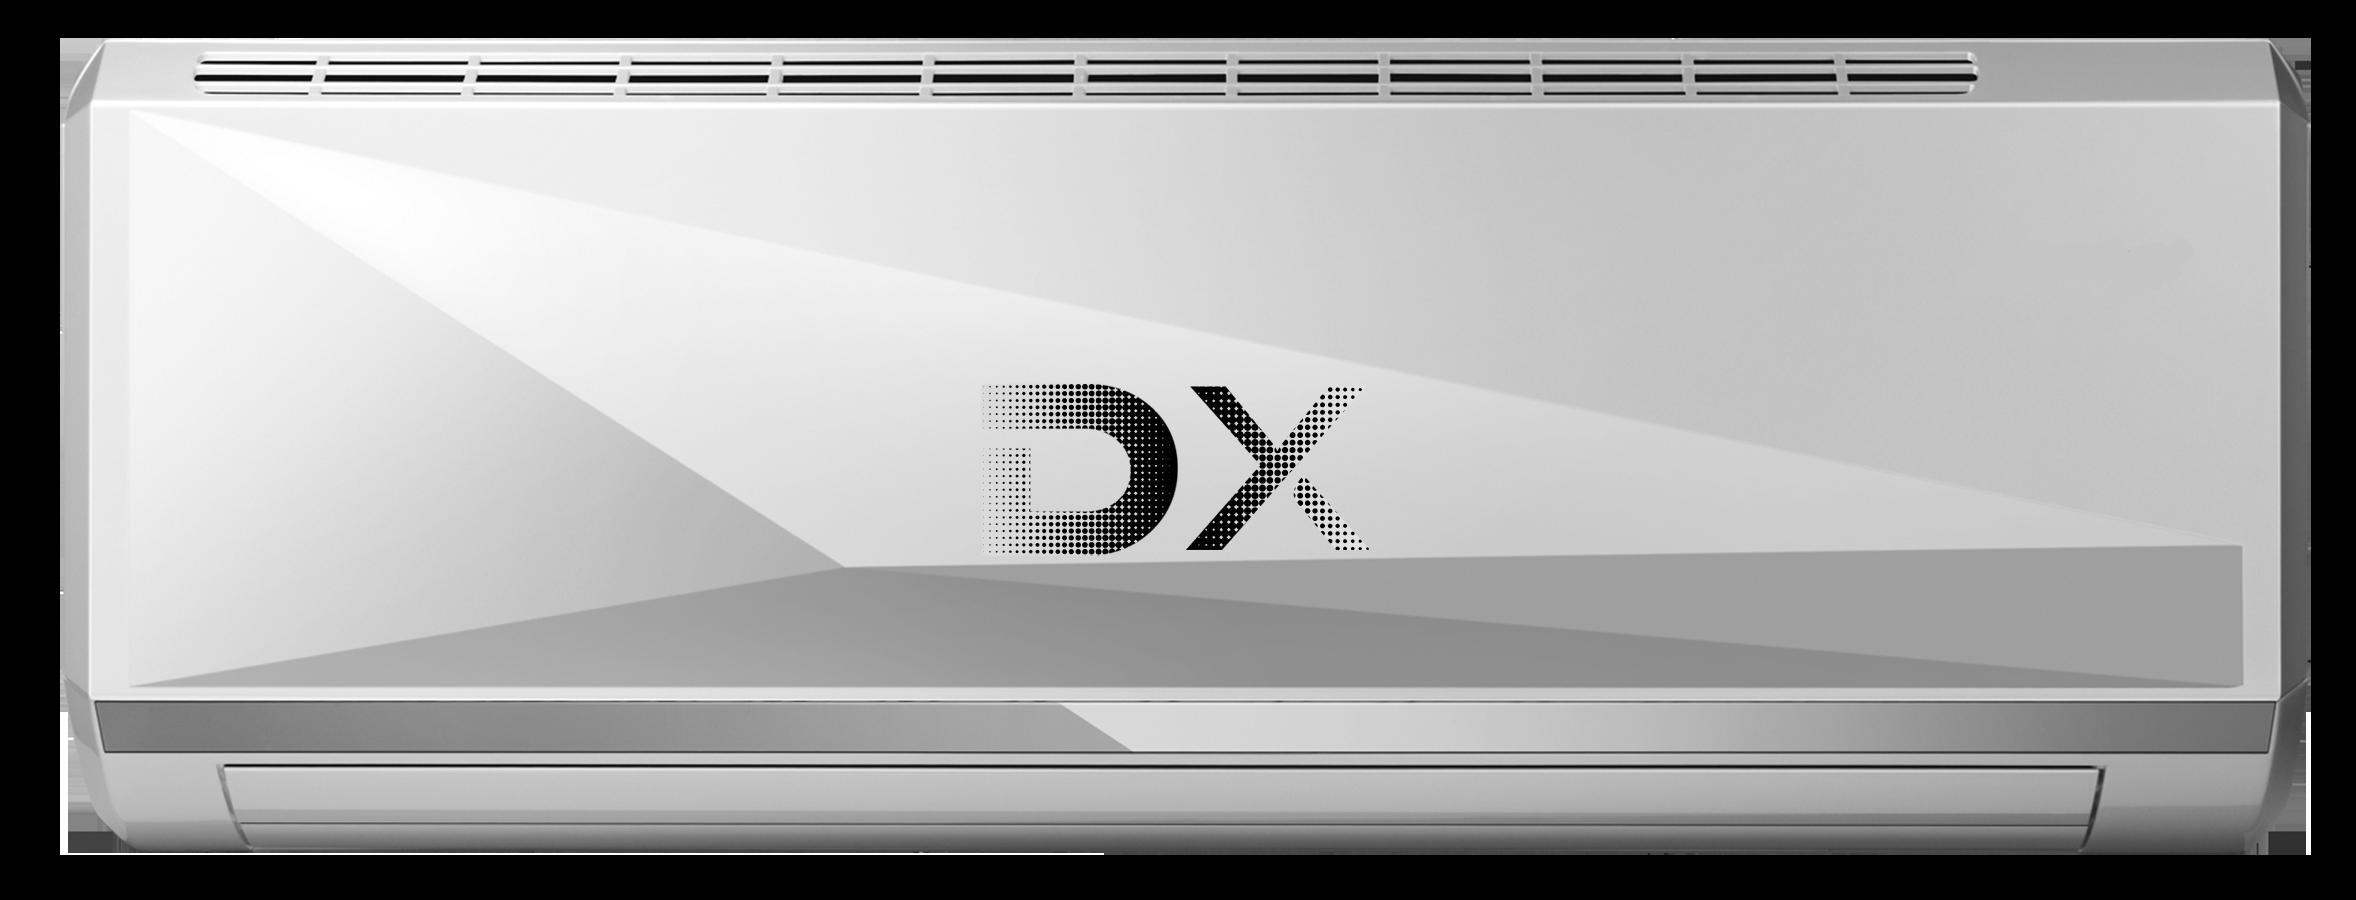 Конкурс на разработку логотипа для компании Dantex Group  фото f_1705bfeef884edb4.png